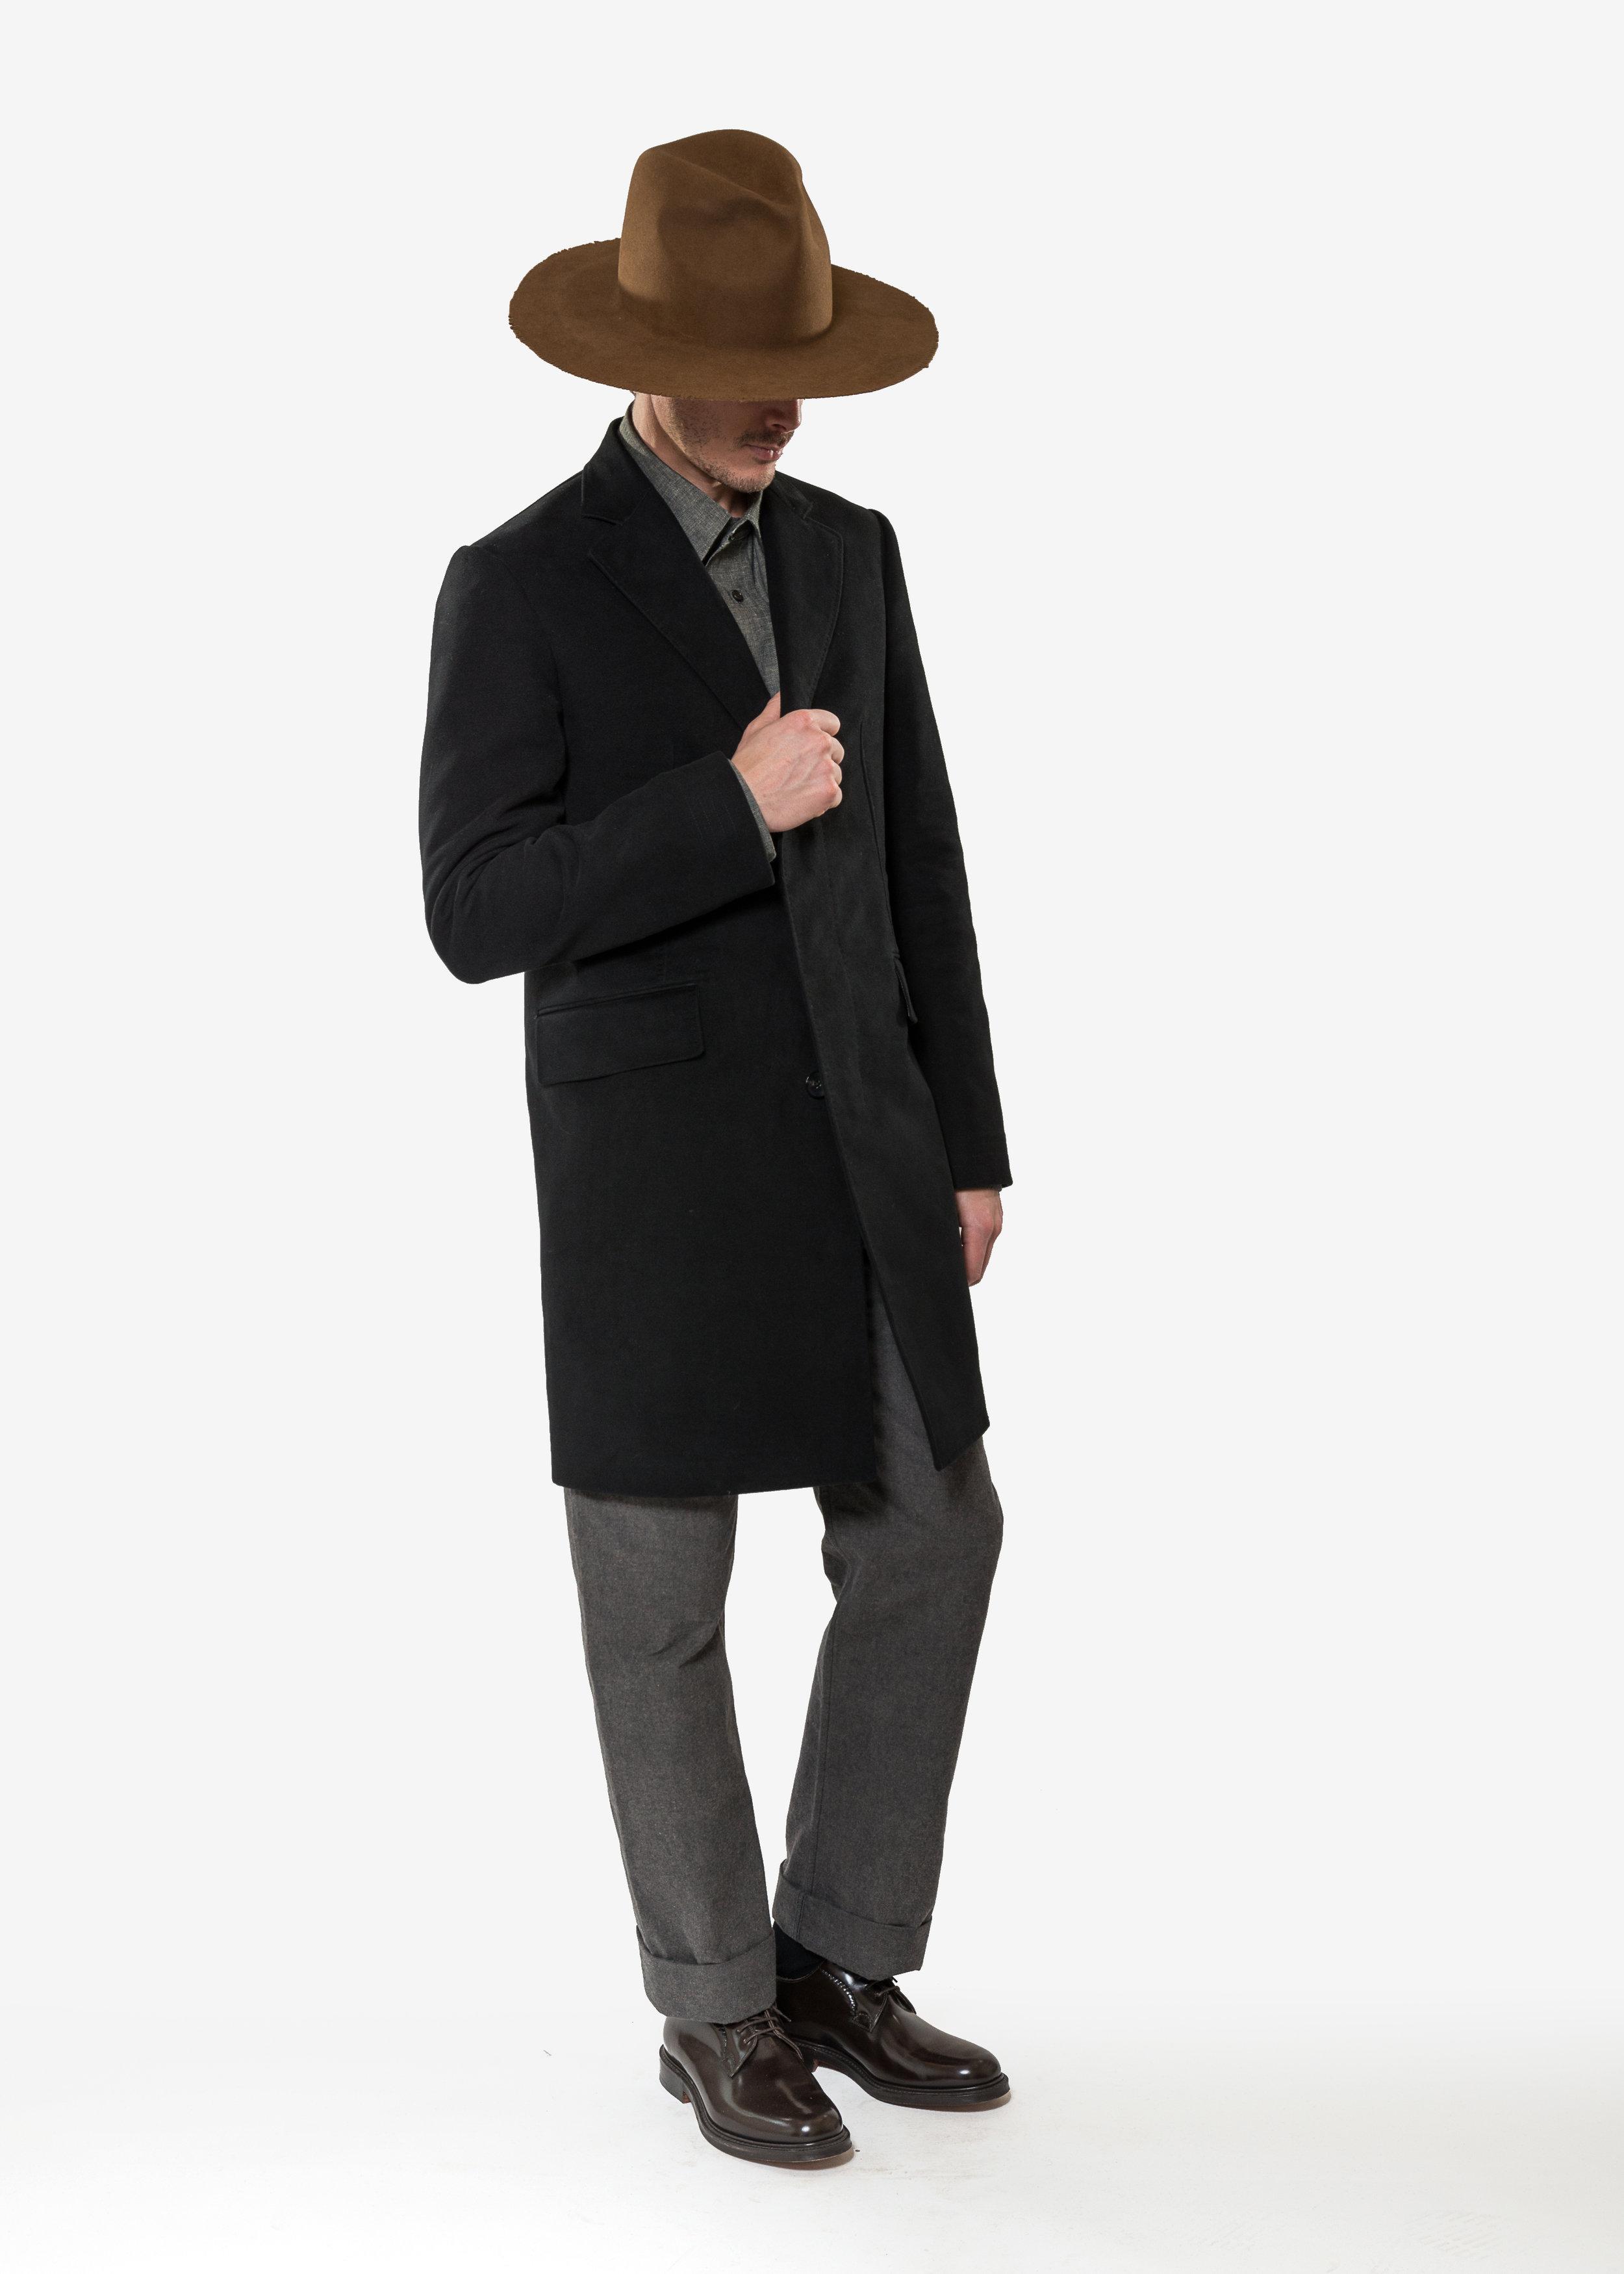 Mr Smith Paris AW18 - Loden Coat